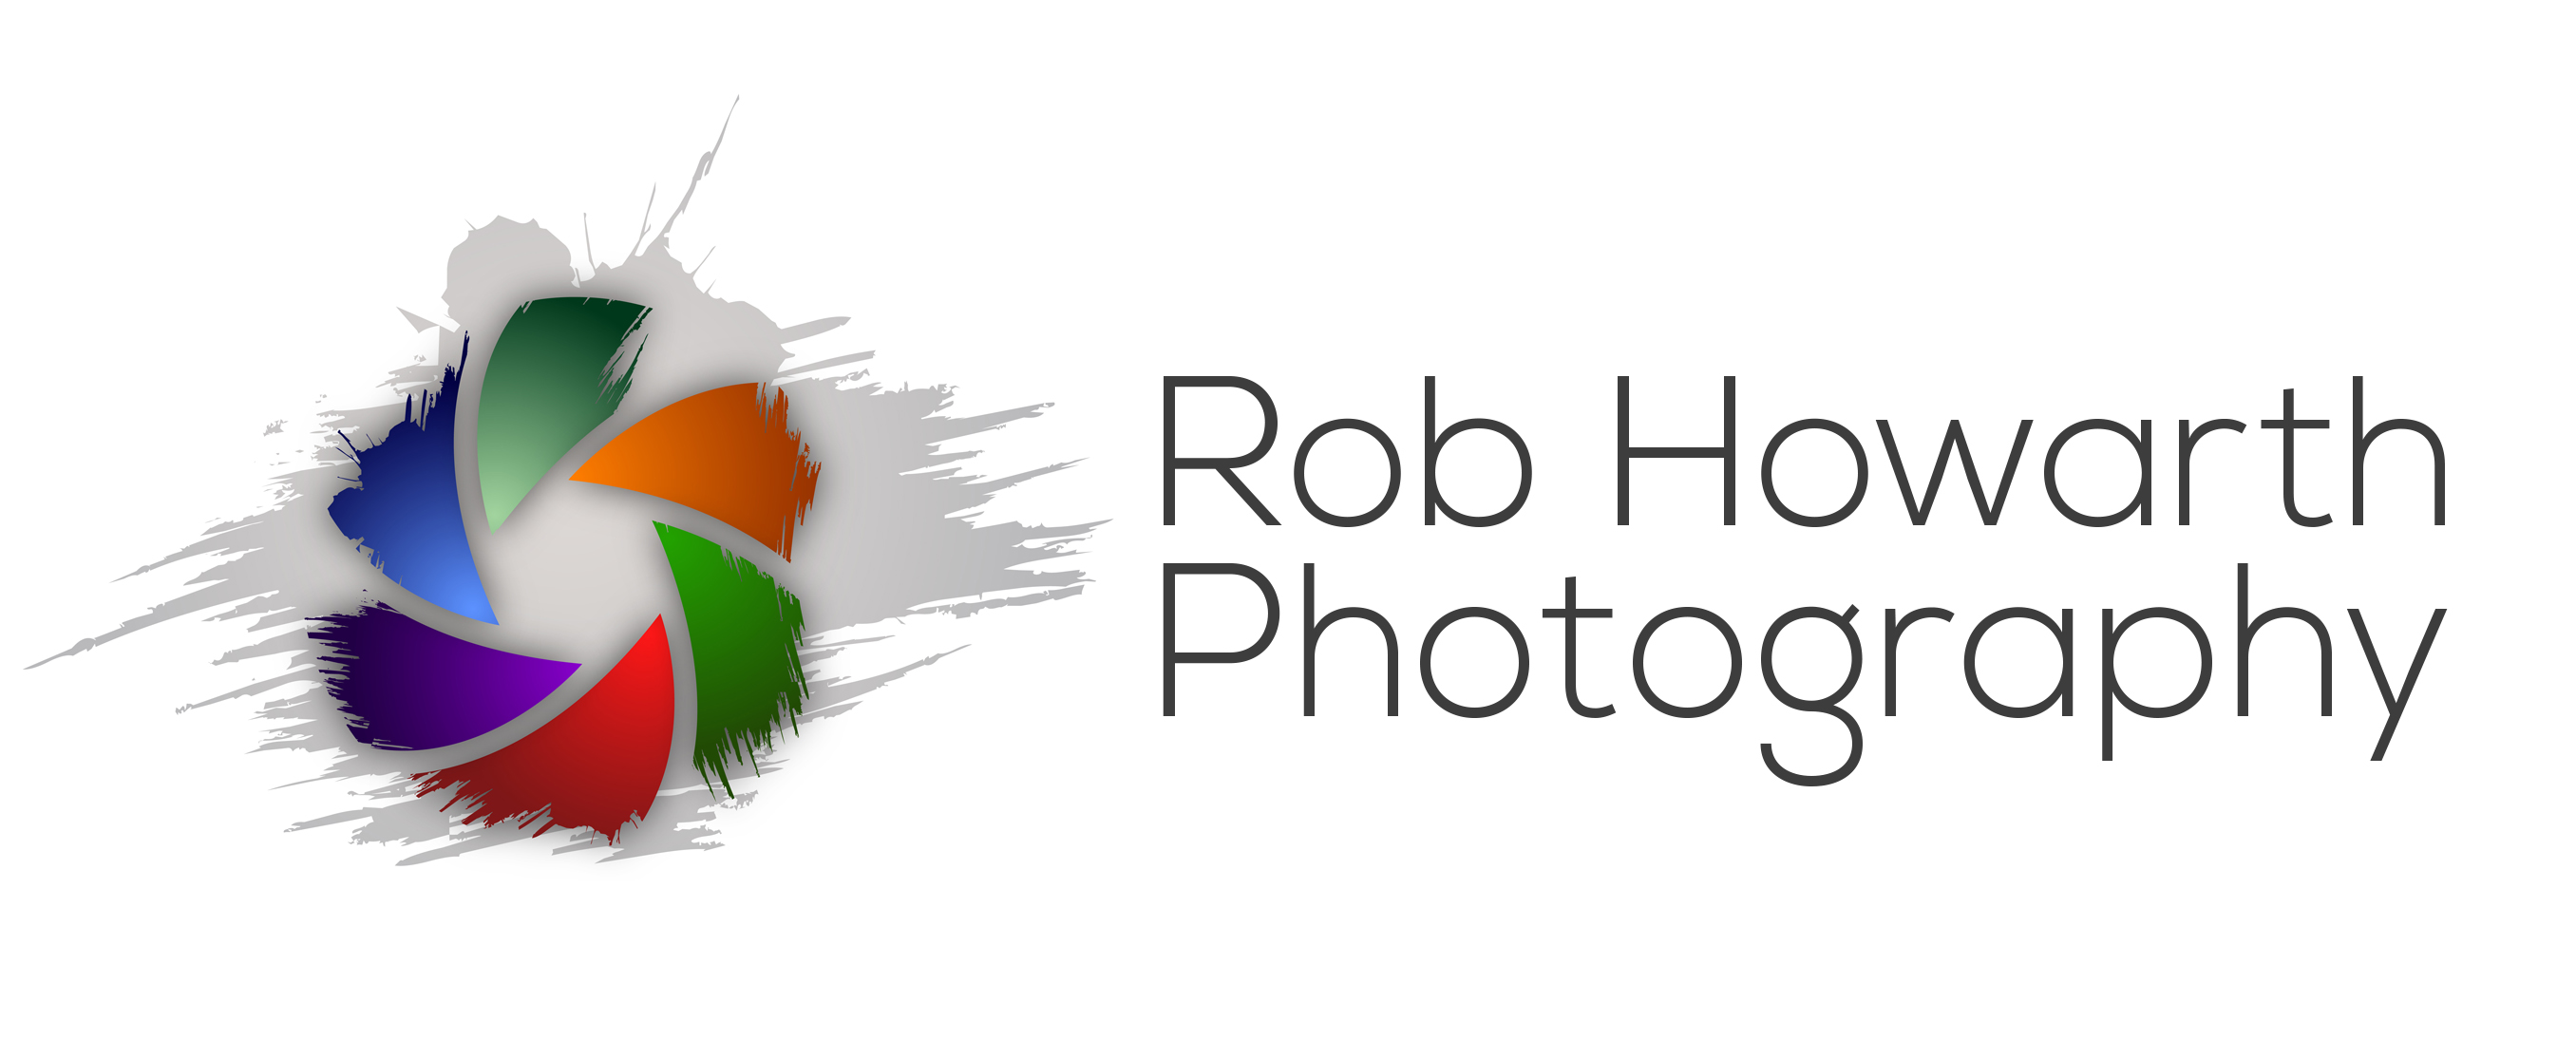 Rob Howarth Photography